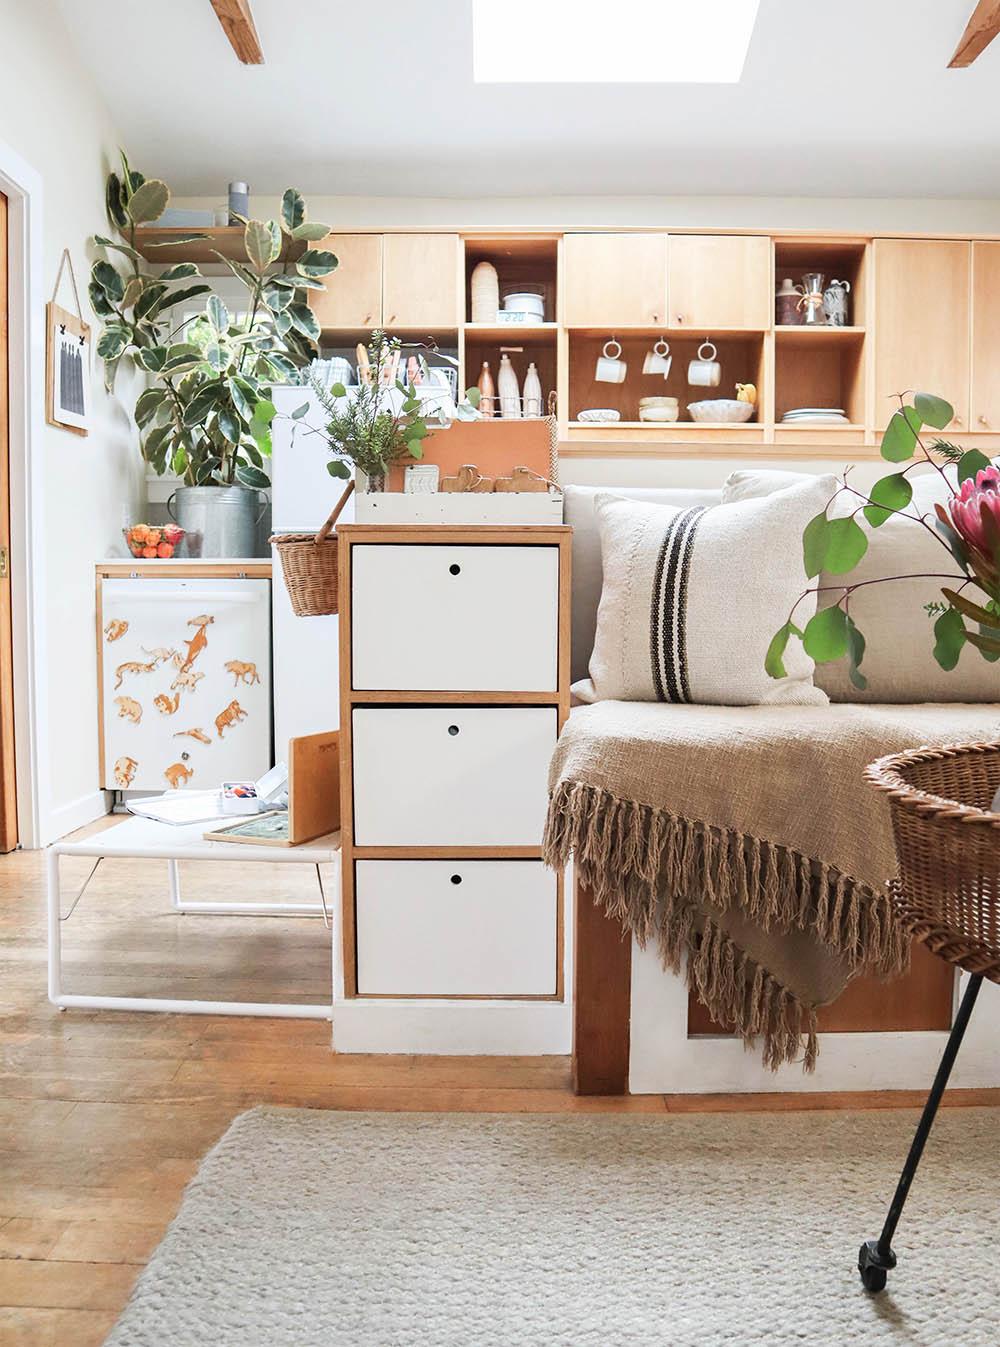 tinyhouse_builtin_drawers_1.jpg